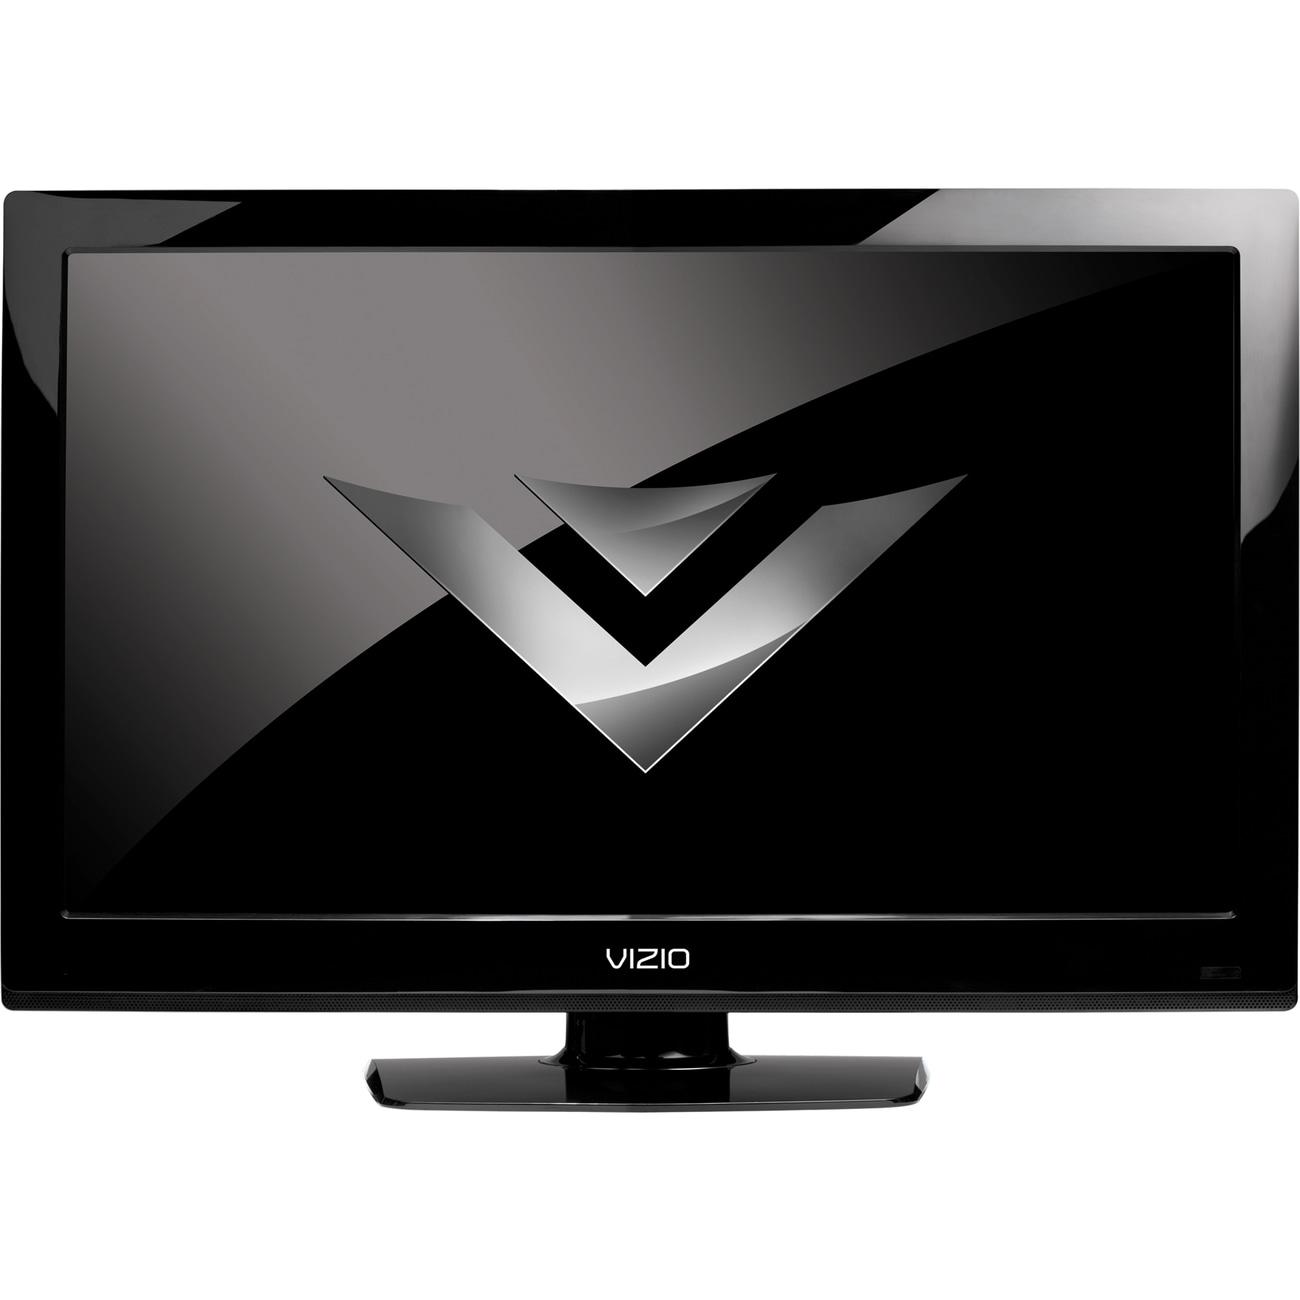 "Vizio E320ME 32"" Factory refurbished 720p LCD TV - 16:9 - HDTV"